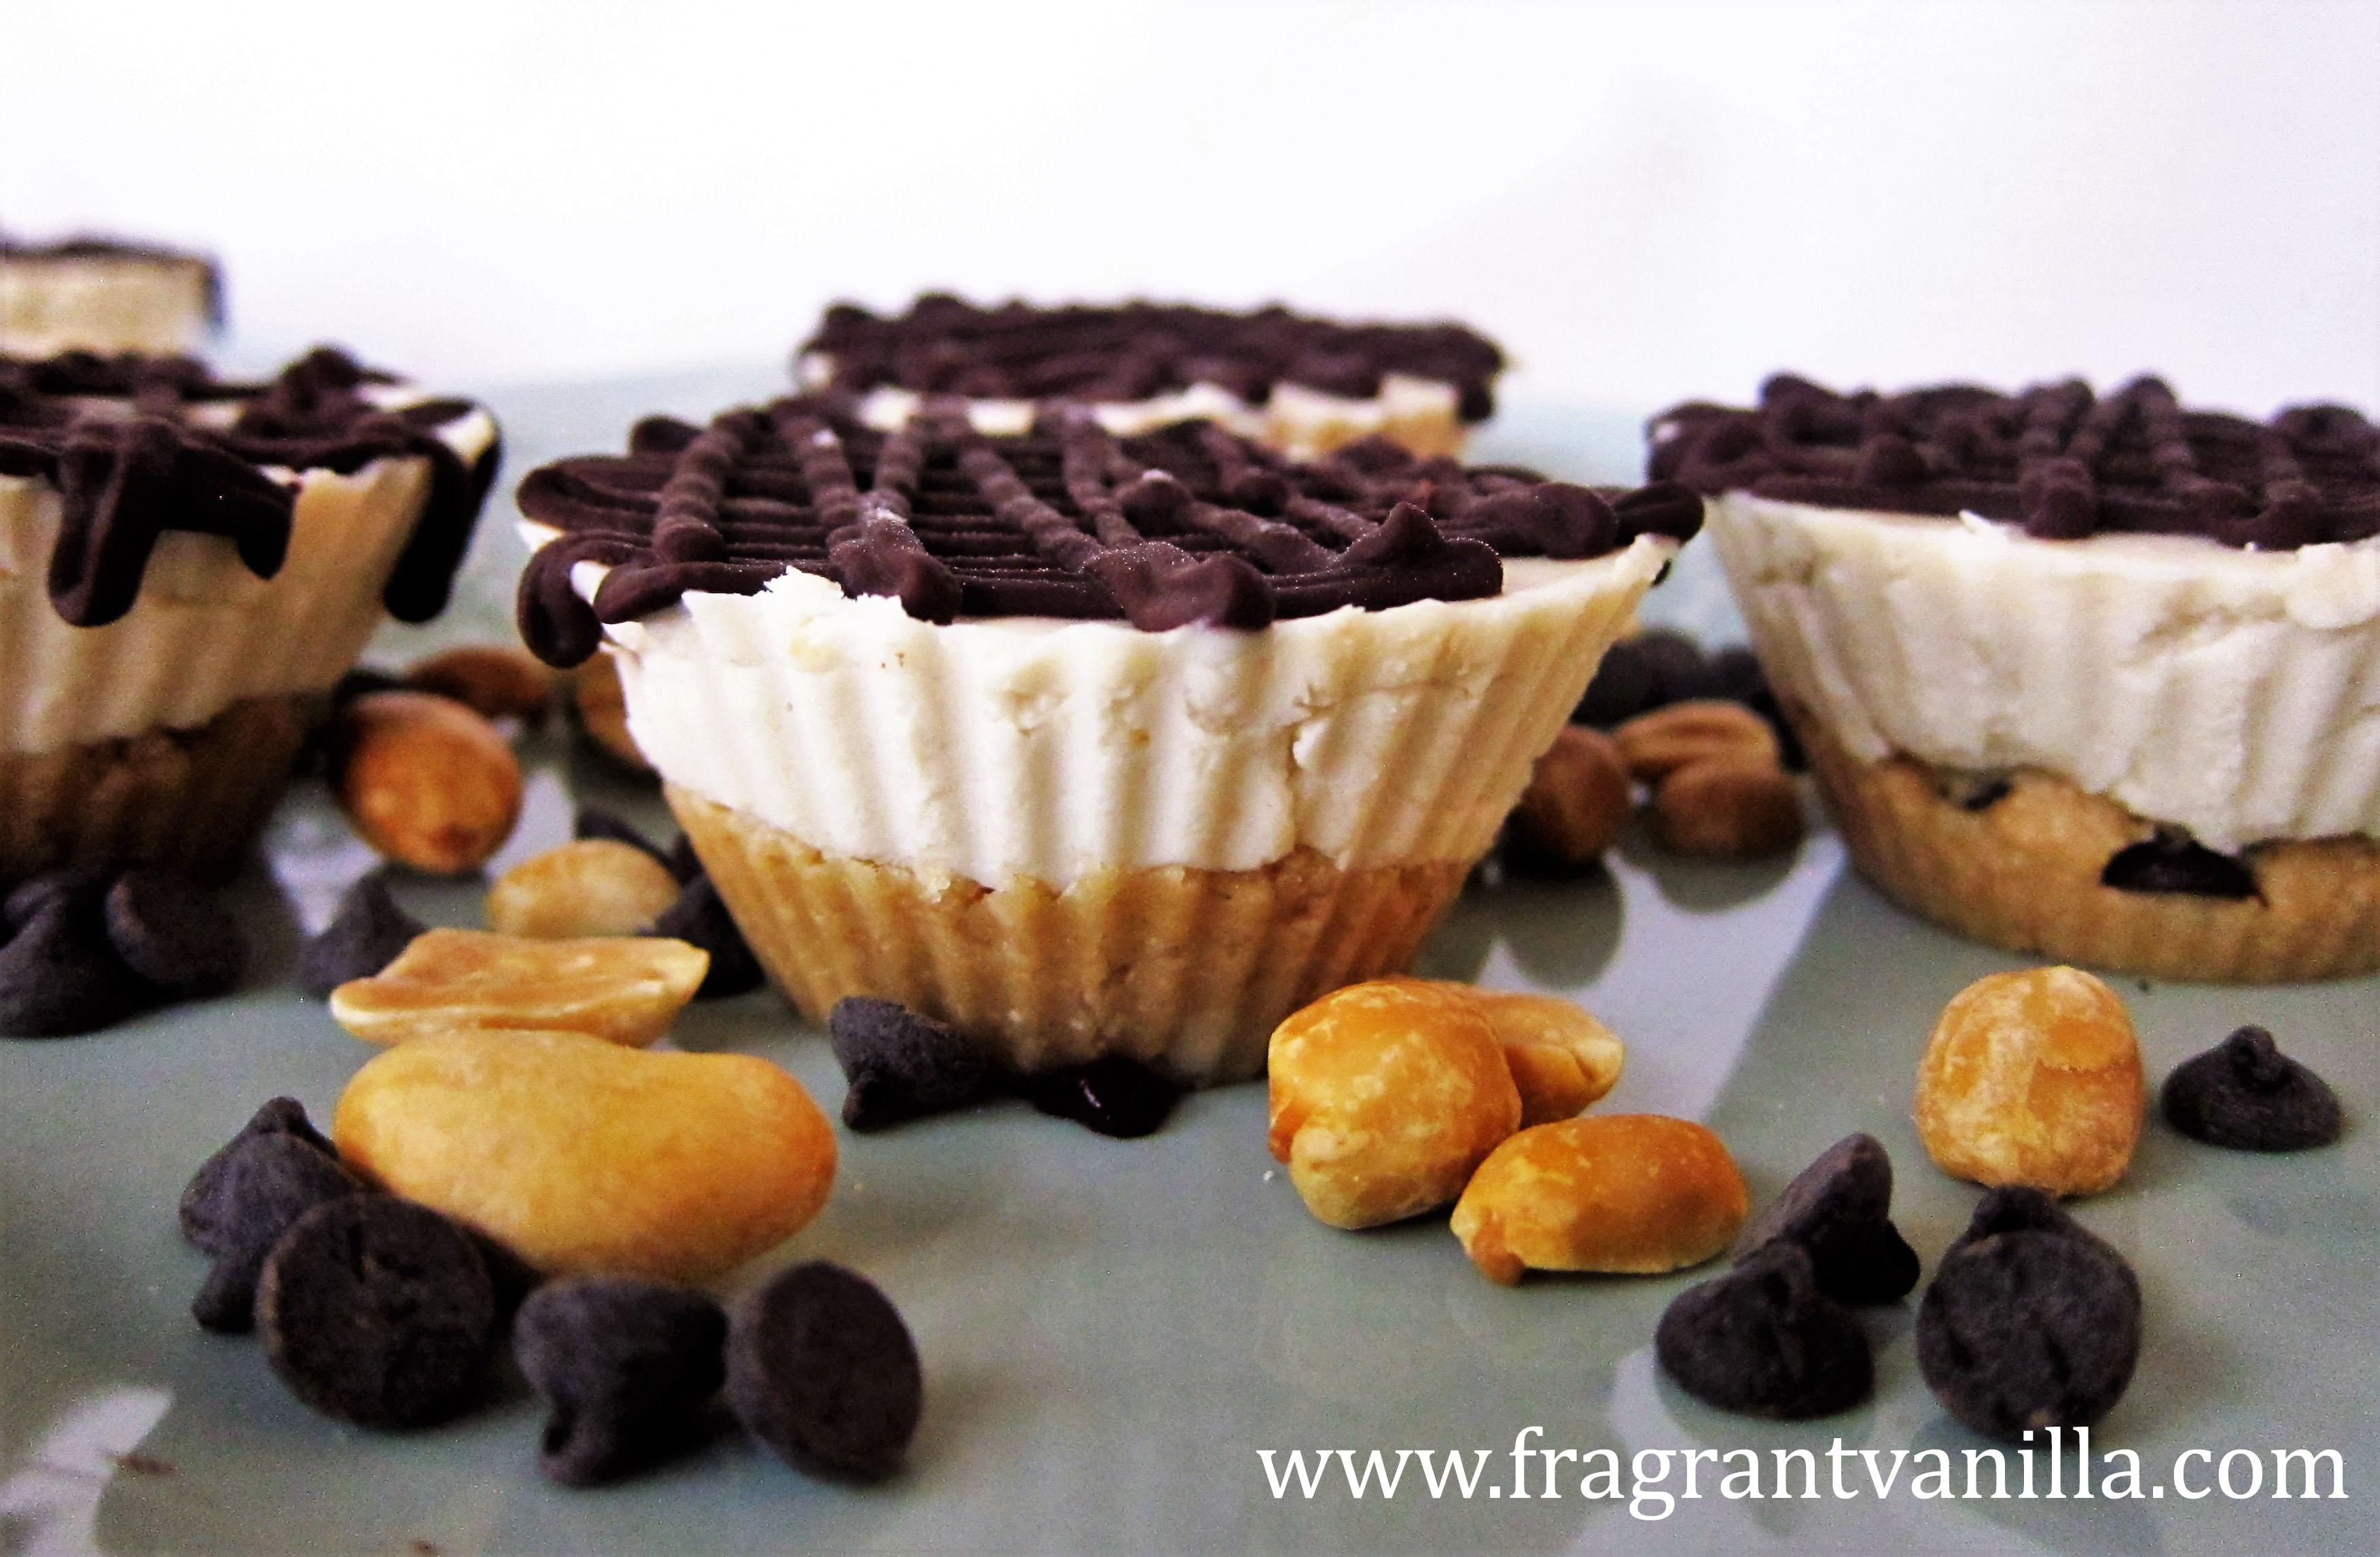 Vegan Mini Peanut Butter Chocolate Chip Cookie Dough Cheesecakes